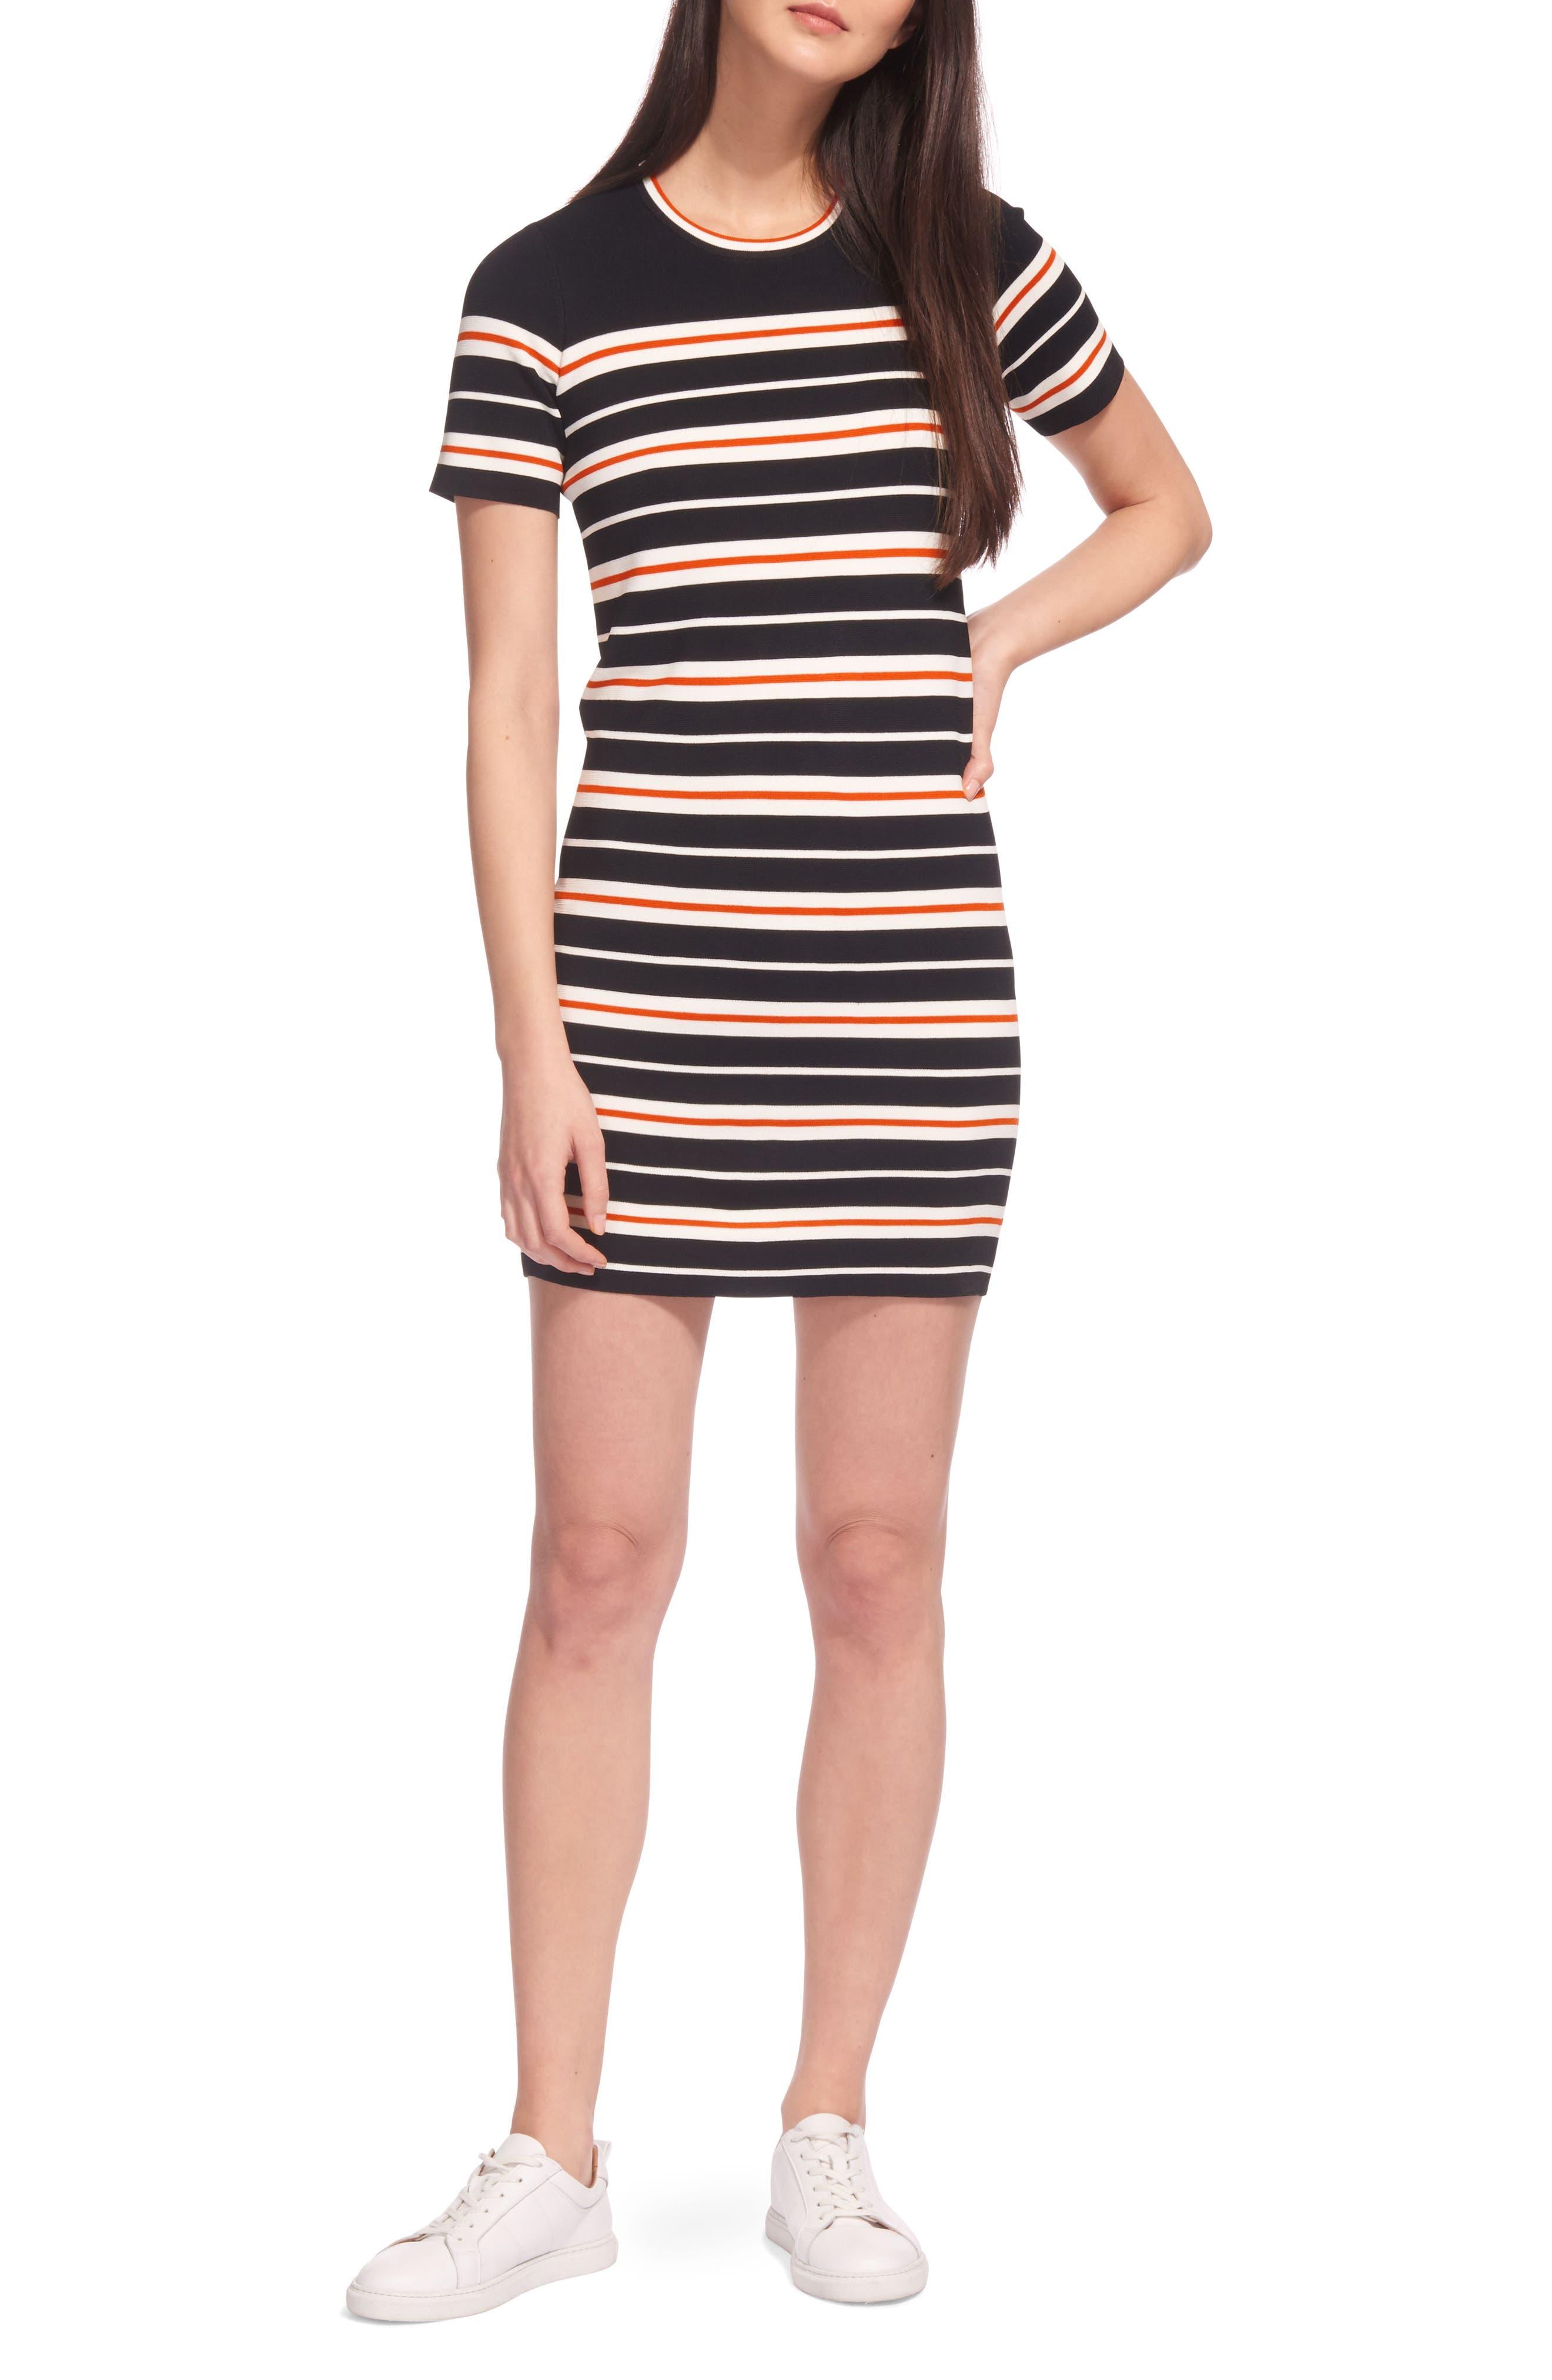 Milano Stripe Knit Dress,                             Main thumbnail 1, color,                             Multicolor